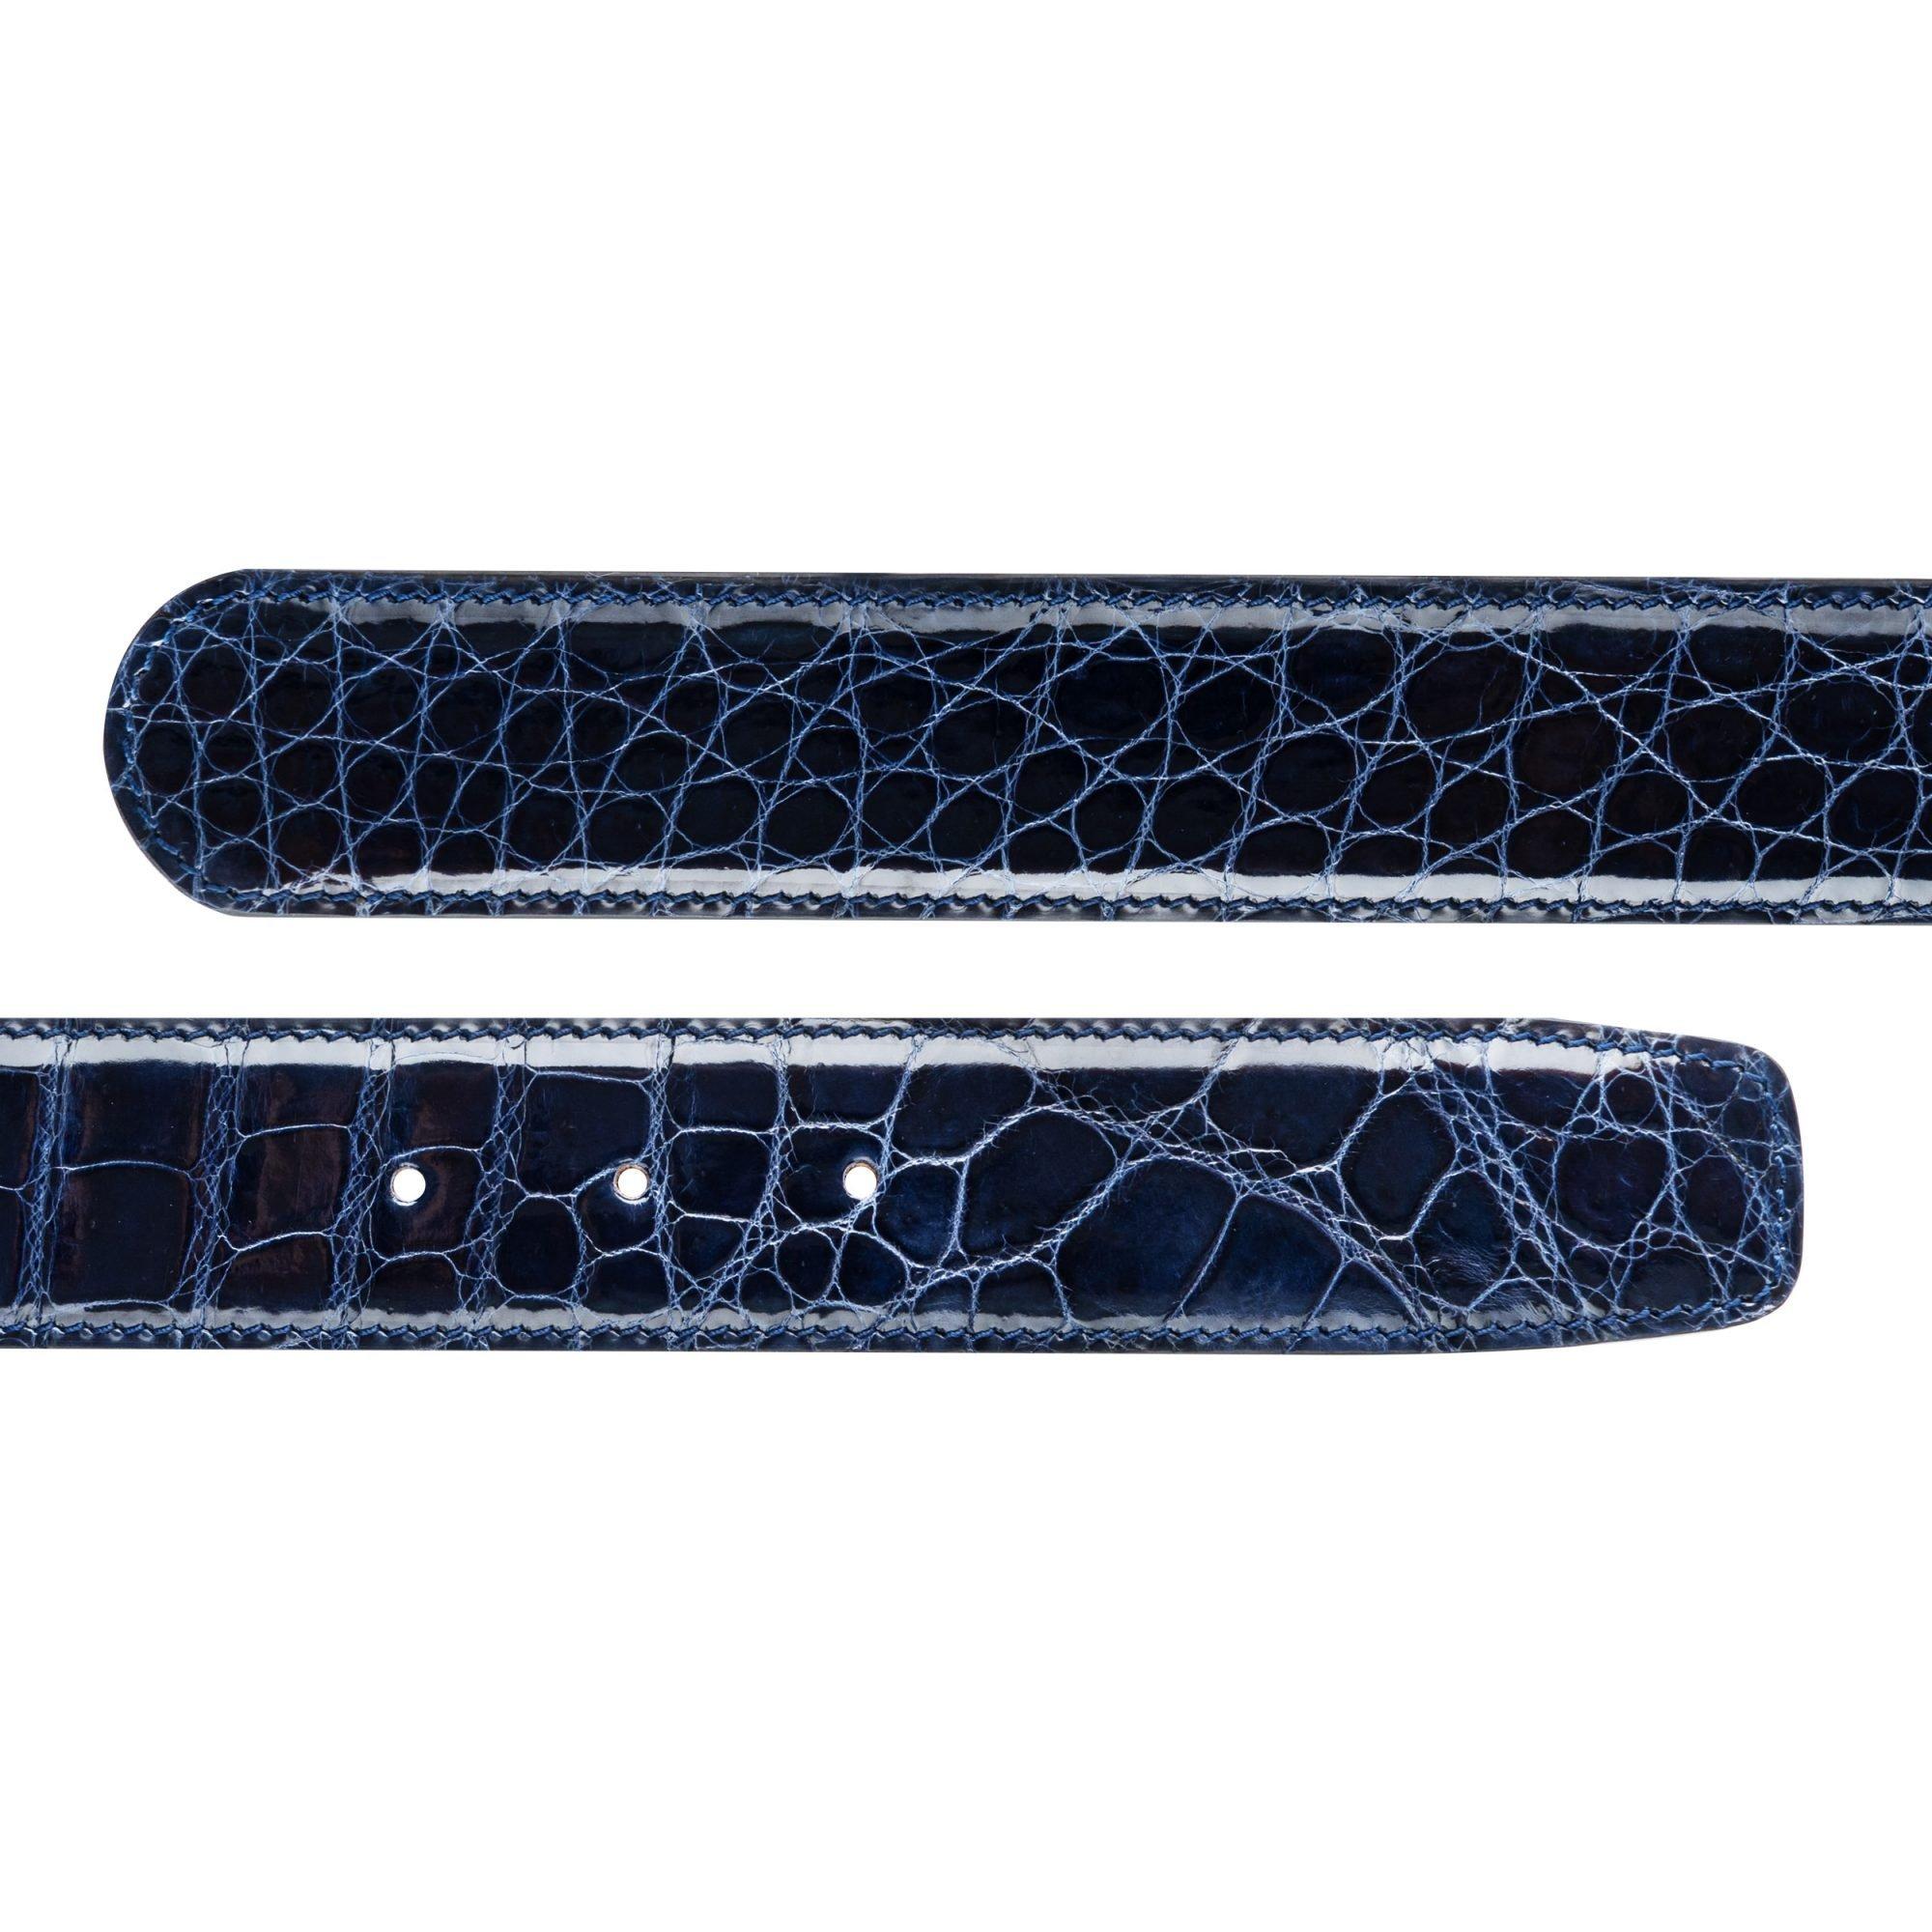 38MM VIKTOR ALEXANDER CROCODILE ALLIGATOR HIGH SHINE GLOSSY NAVY BLUE COLOUR BELT DUAL PROFILE